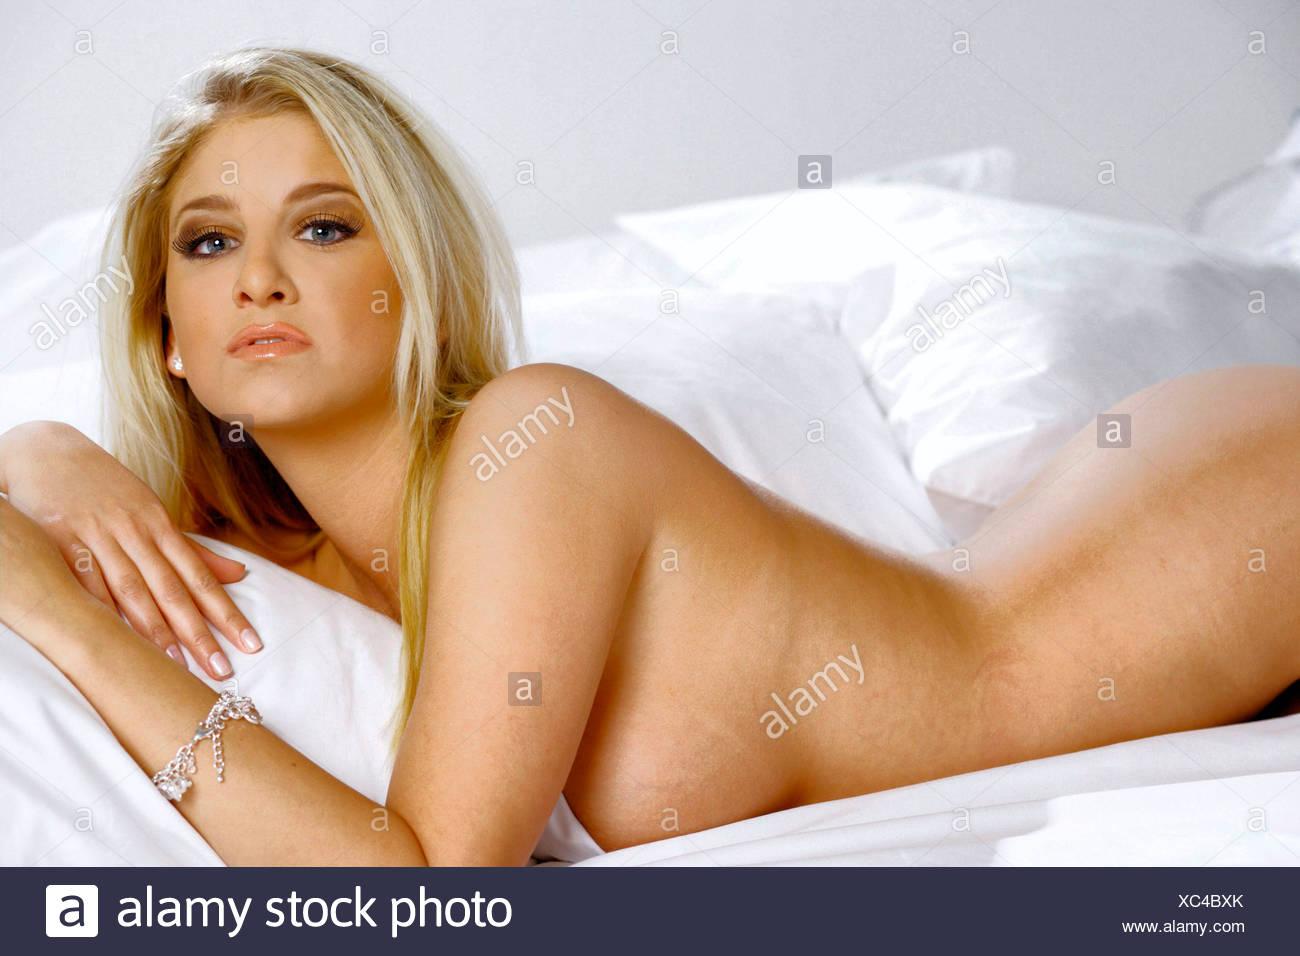 taglich nackt foto